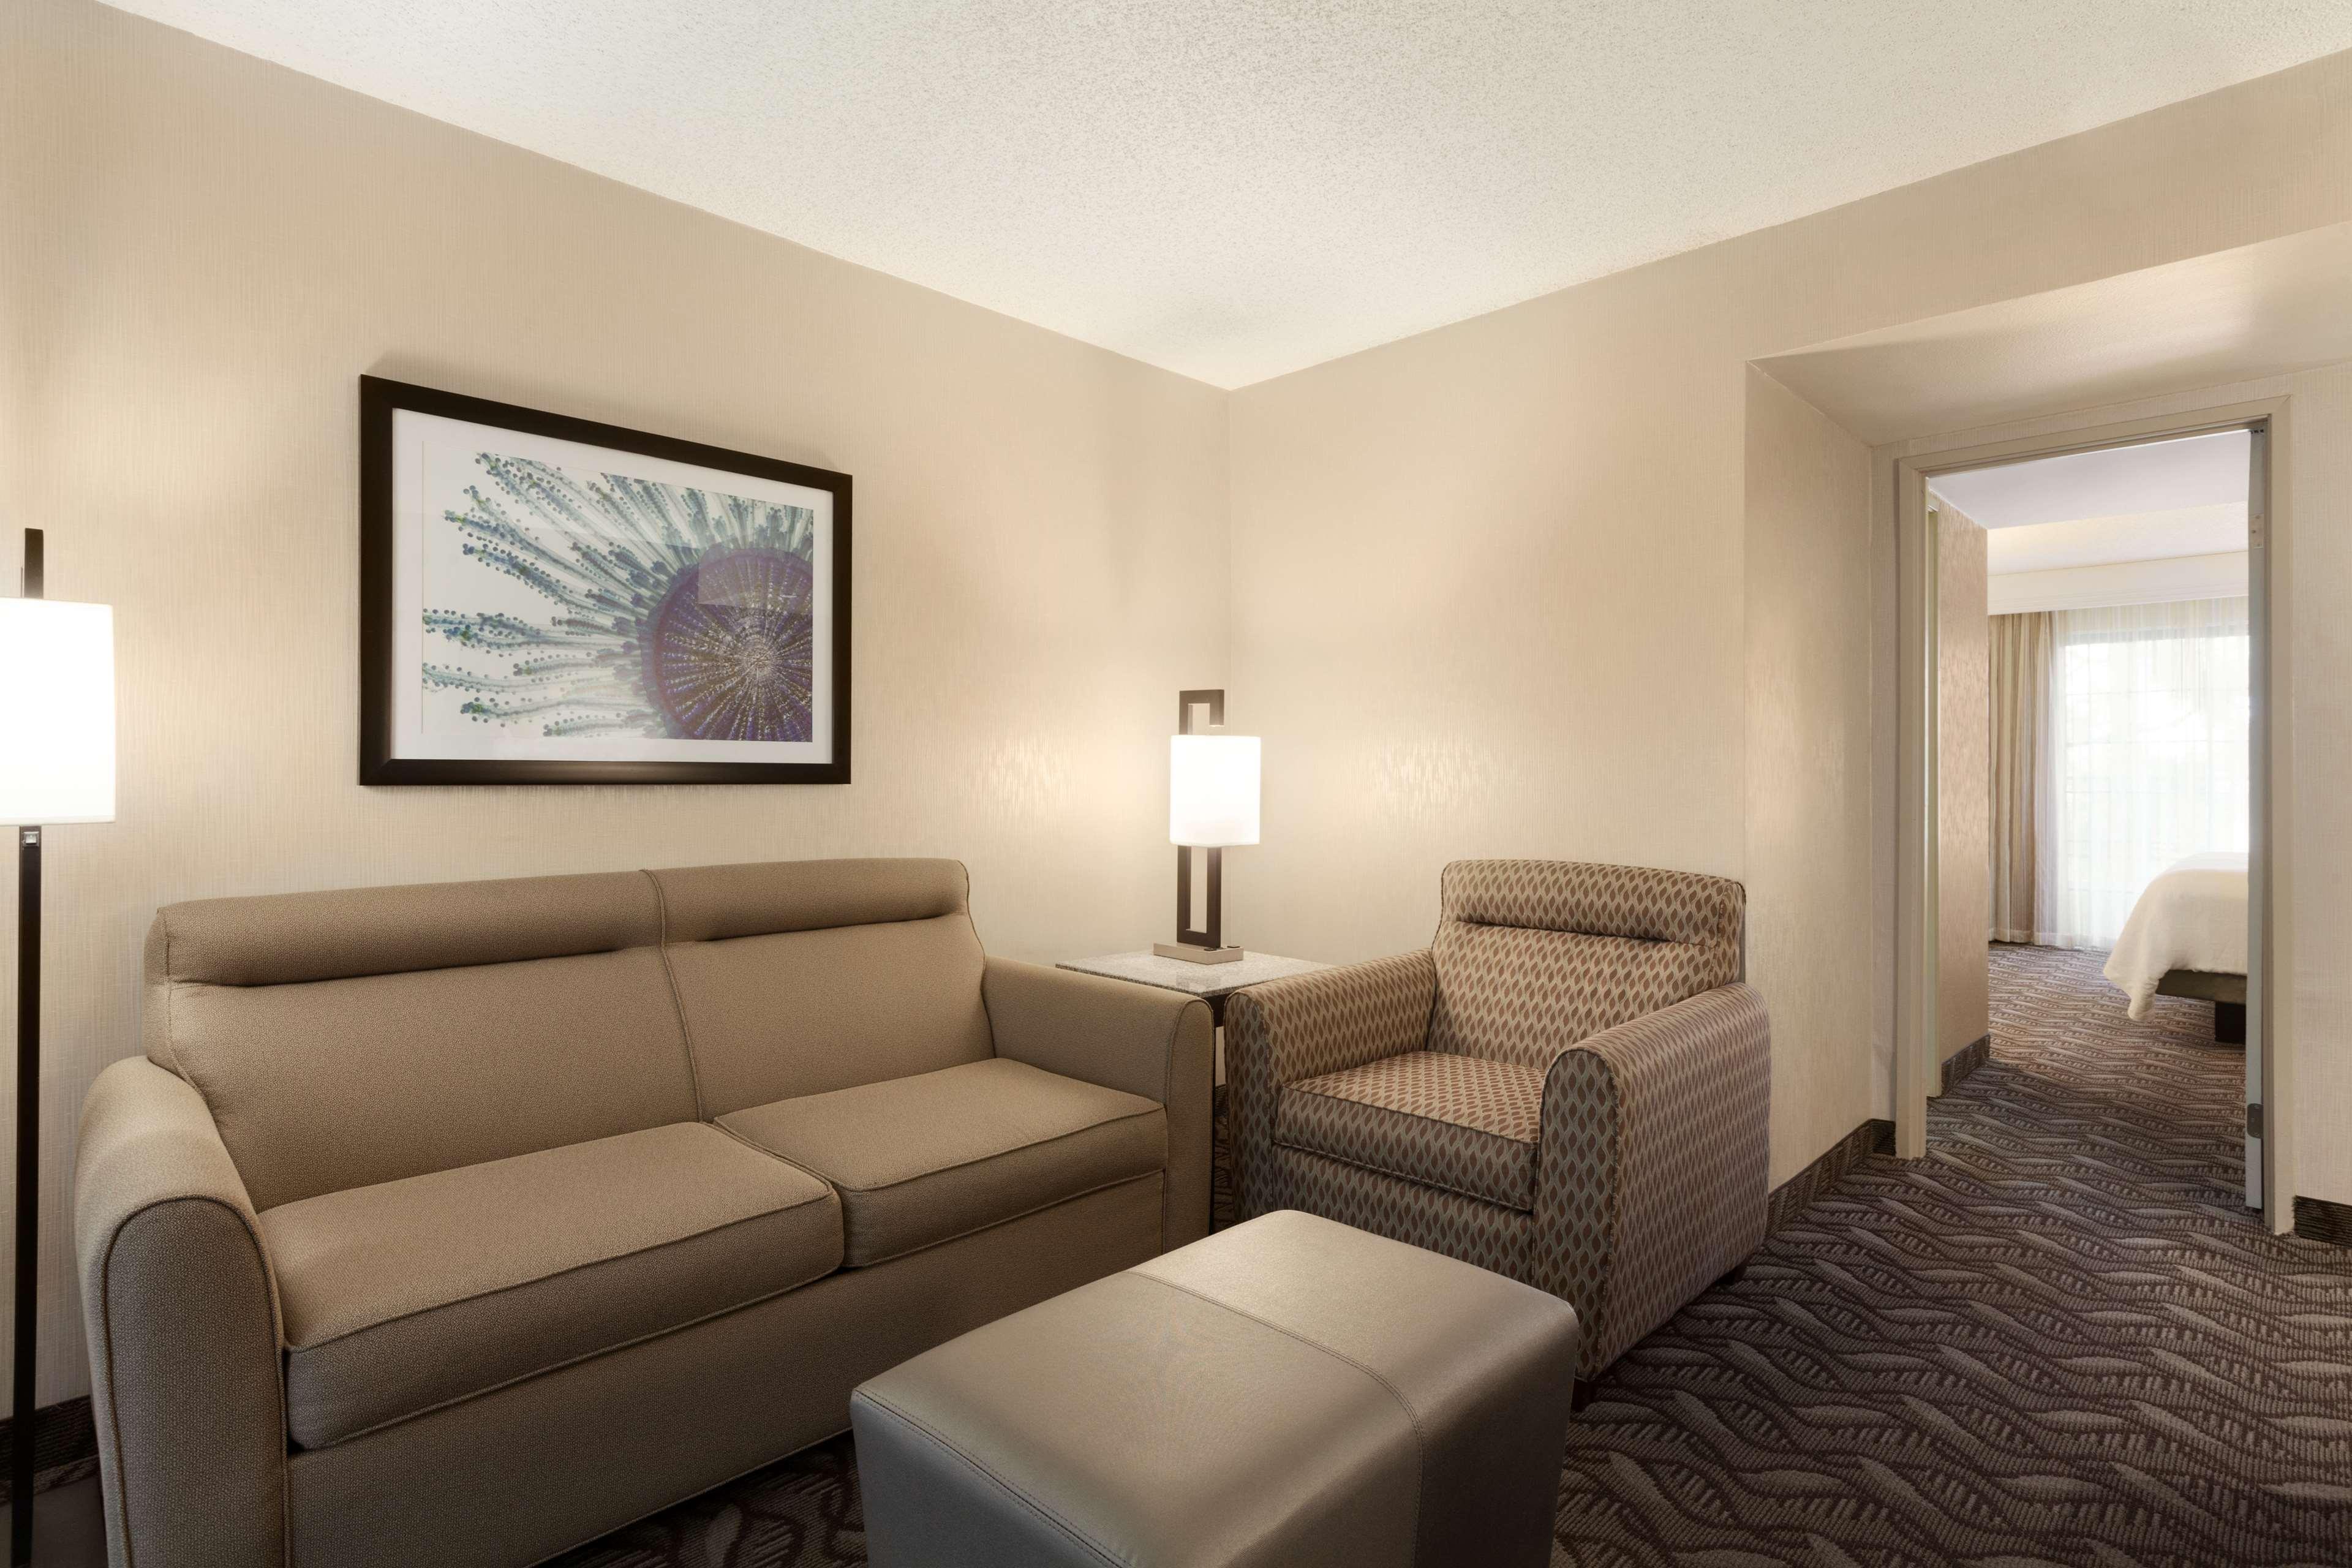 Embassy Suites by Hilton Arcadia Pasadena Area image 19